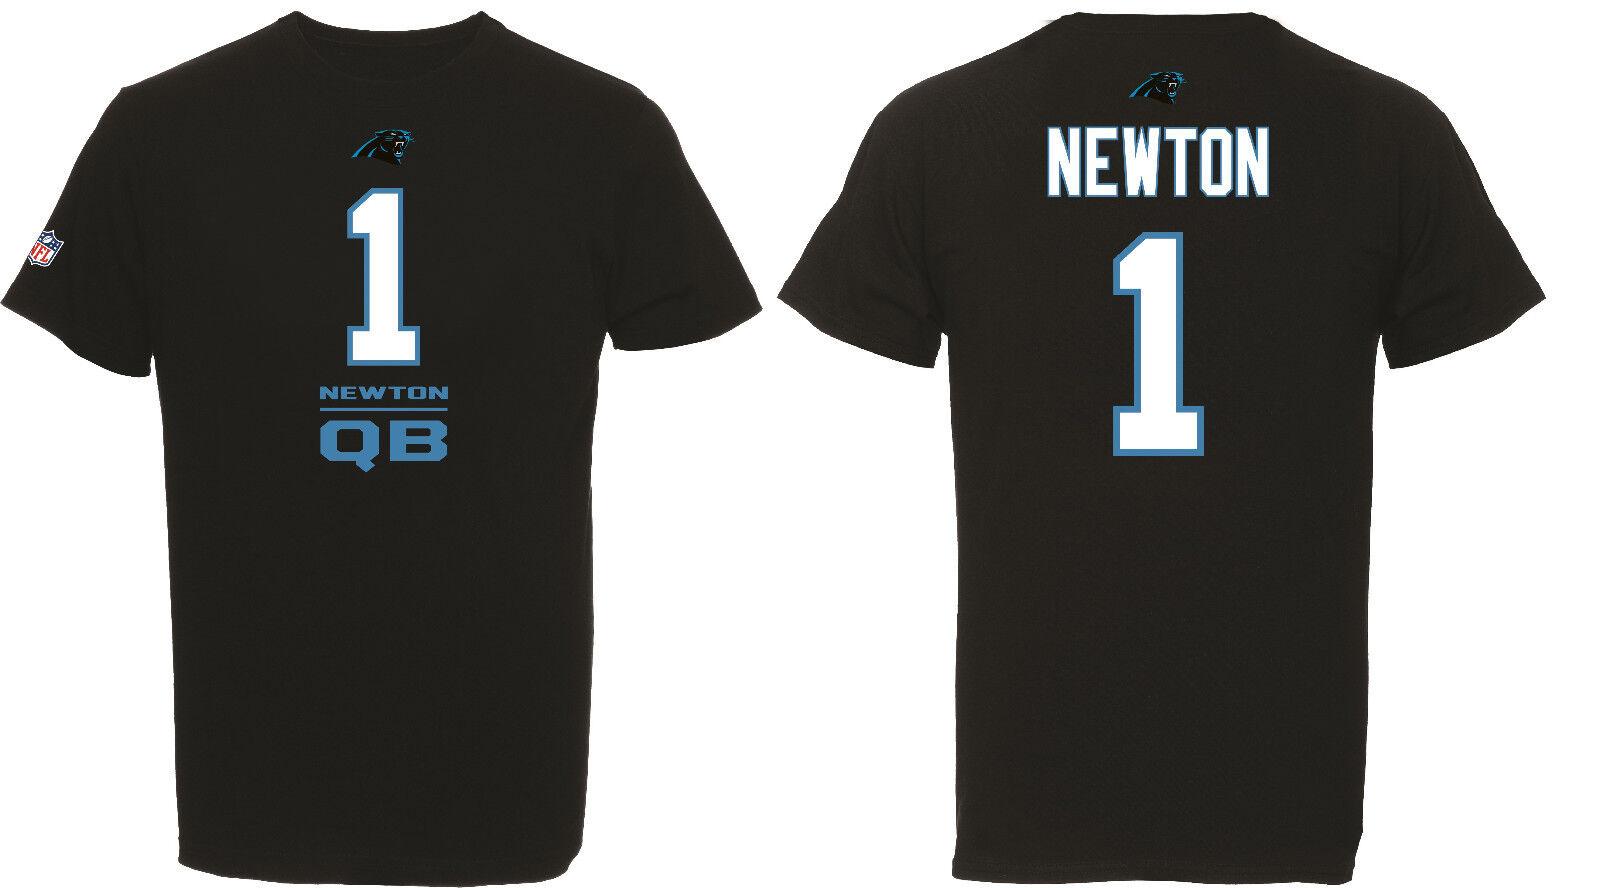 NFL Football T-Shirt Carolina Panthers Cam Newton 1 QB Line Up Trikot Jersey b020605f8